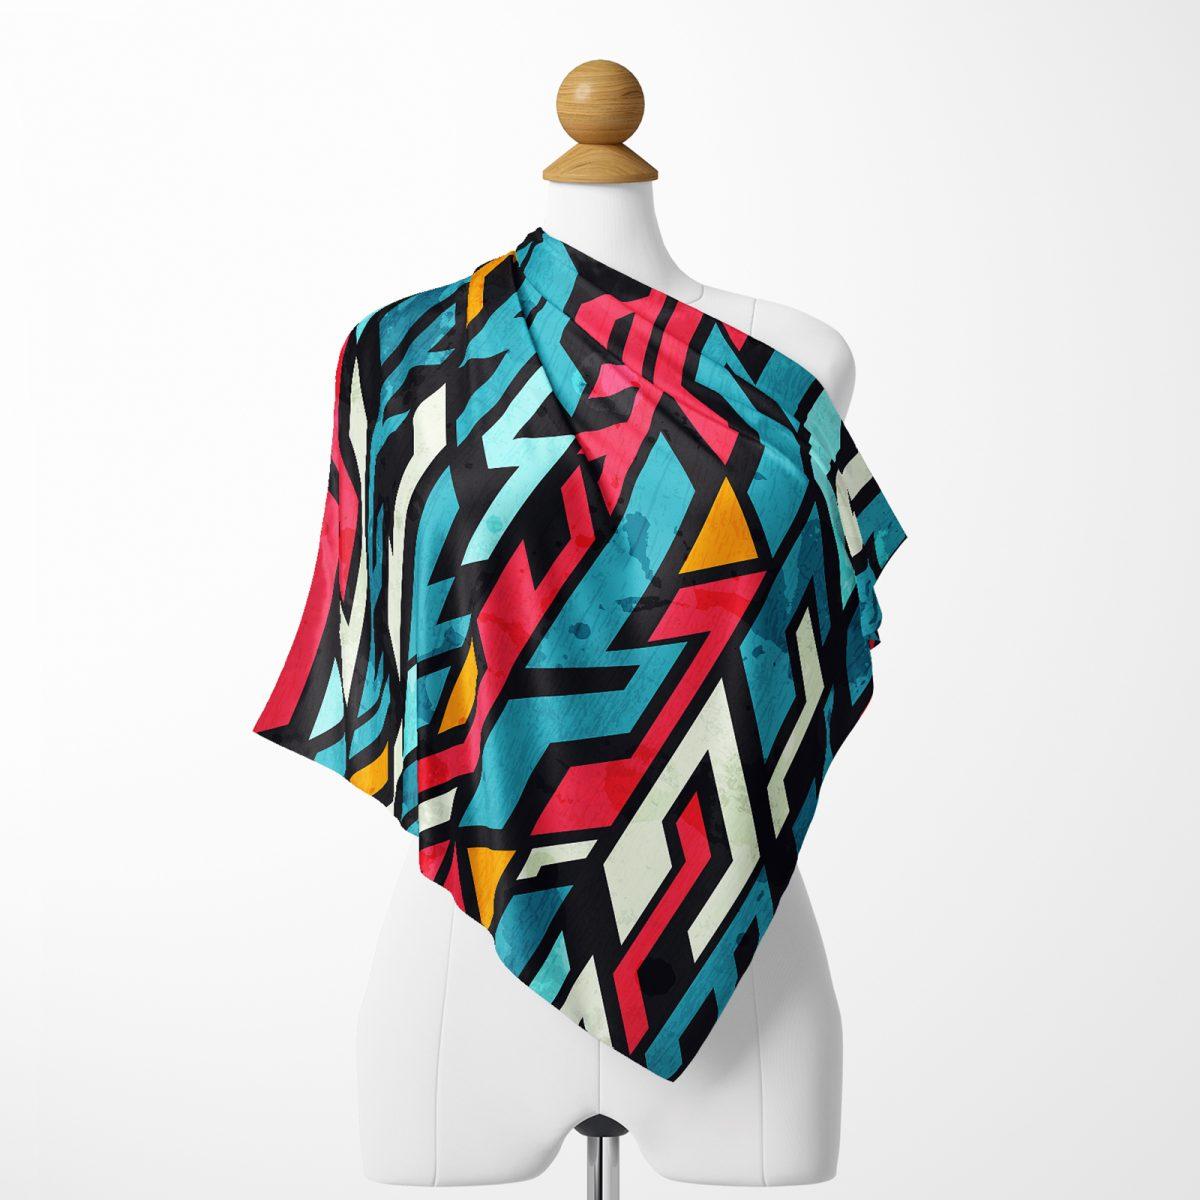 Realhomes Geometrik Motifler Özel tasarım Dijital Baskılı Tivil Eşarp Realhomes